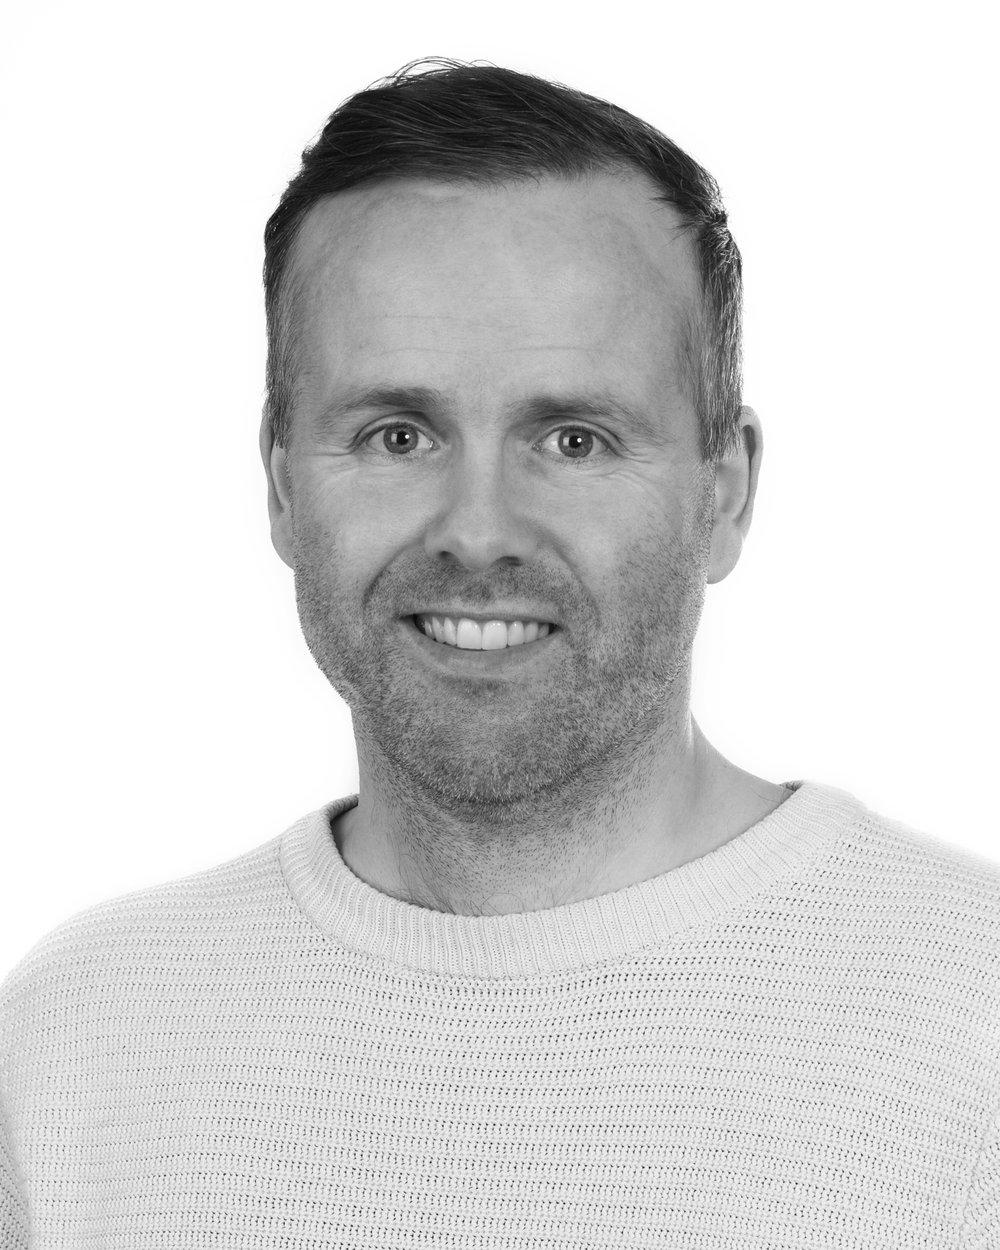 10. Hannes Ingi Geirsson